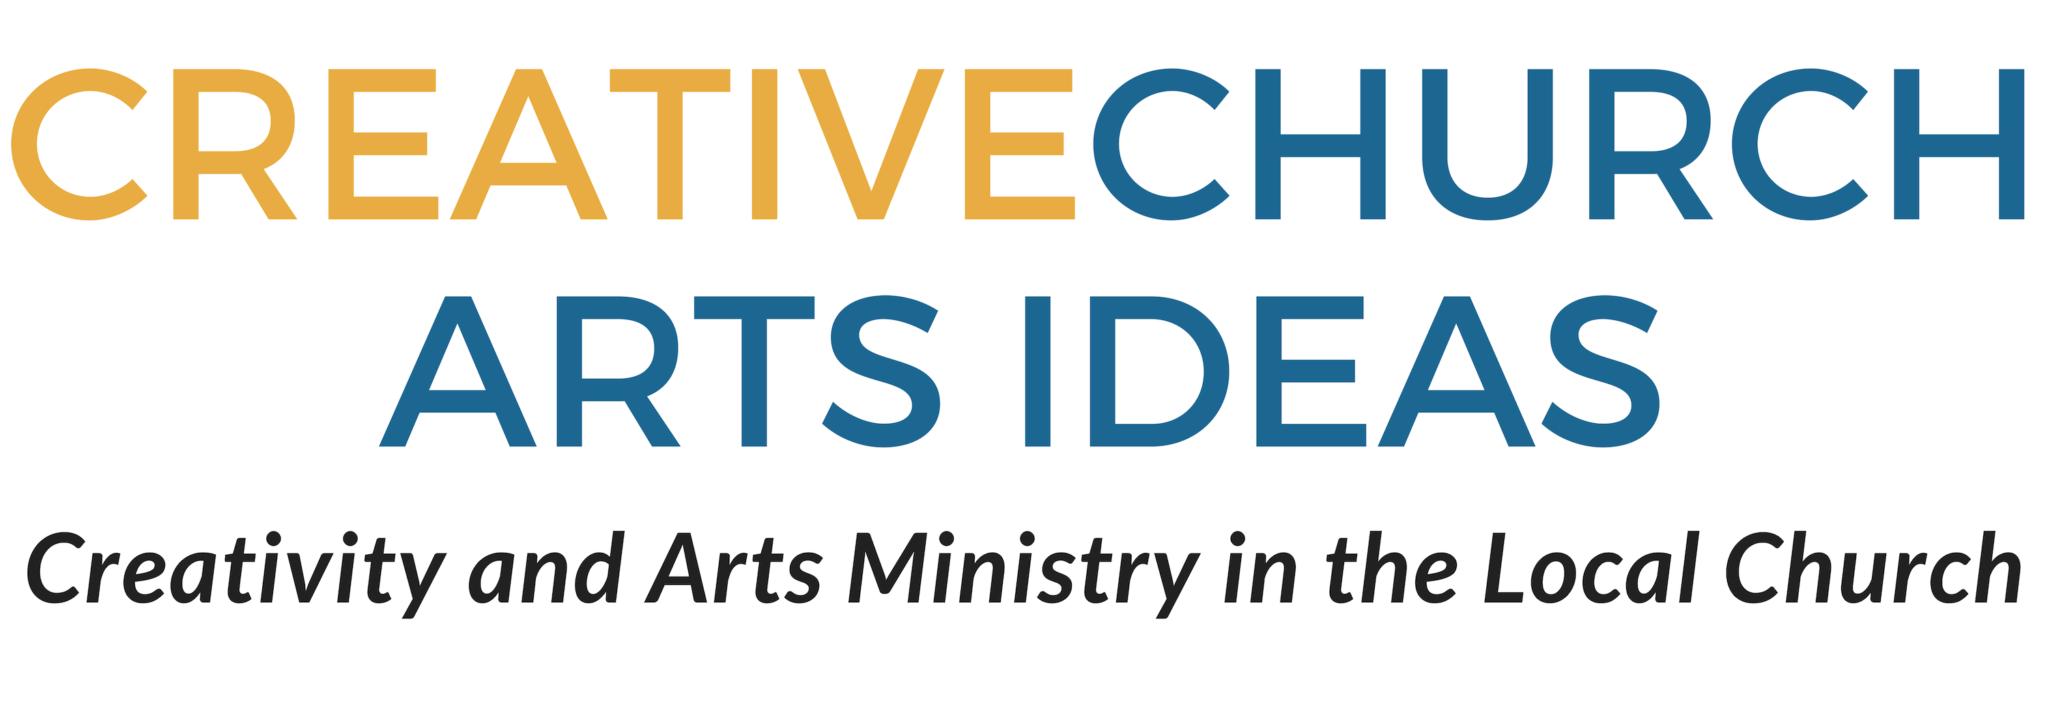 CREATIVECHURCH     ARTS IDEAS